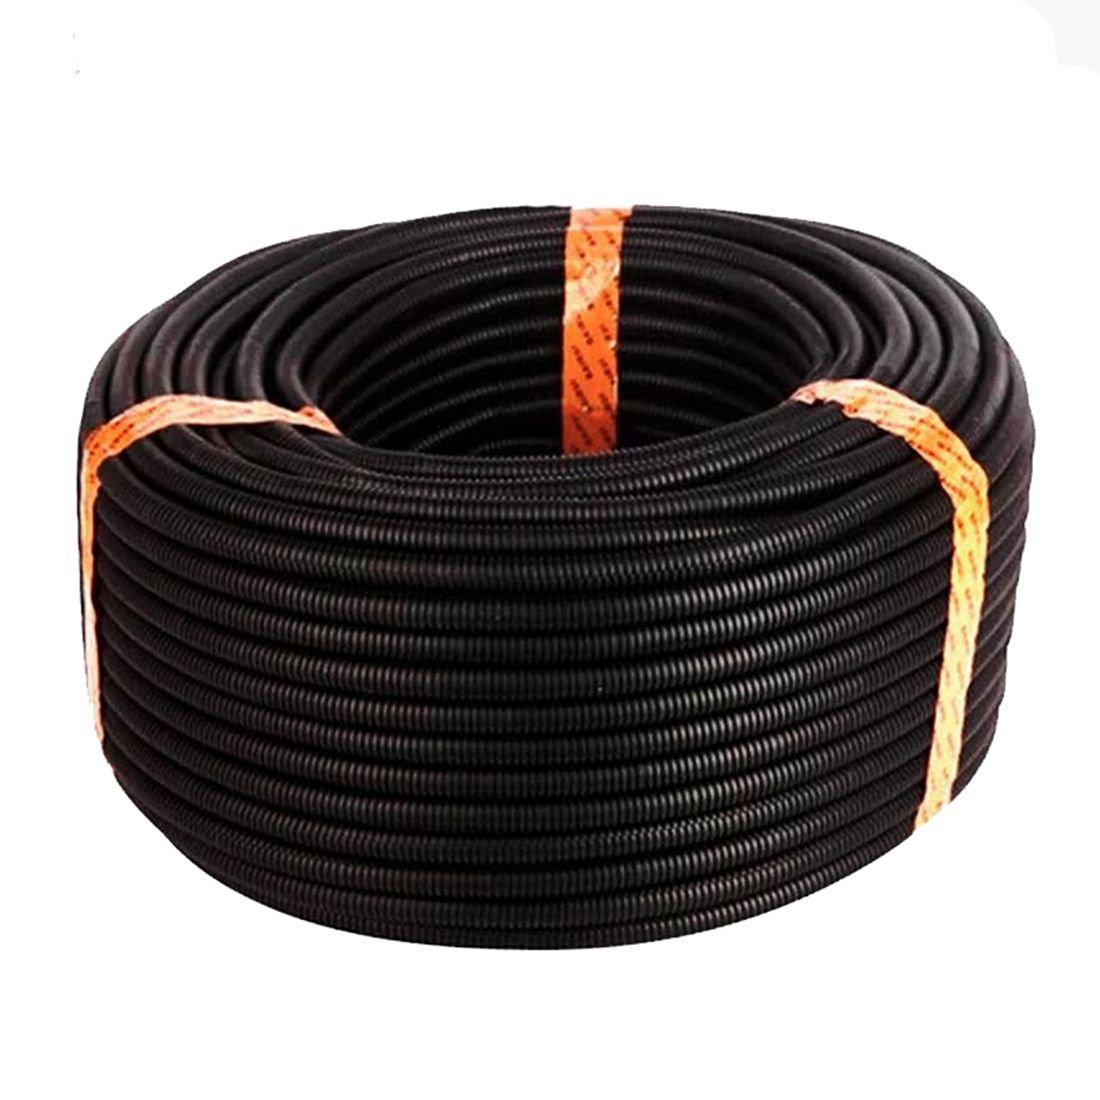 Cikuso 100 Ft. 3/4 inch Split Wire Loom Conduit Polyethylene Tubing Black Color Sleeve Tube